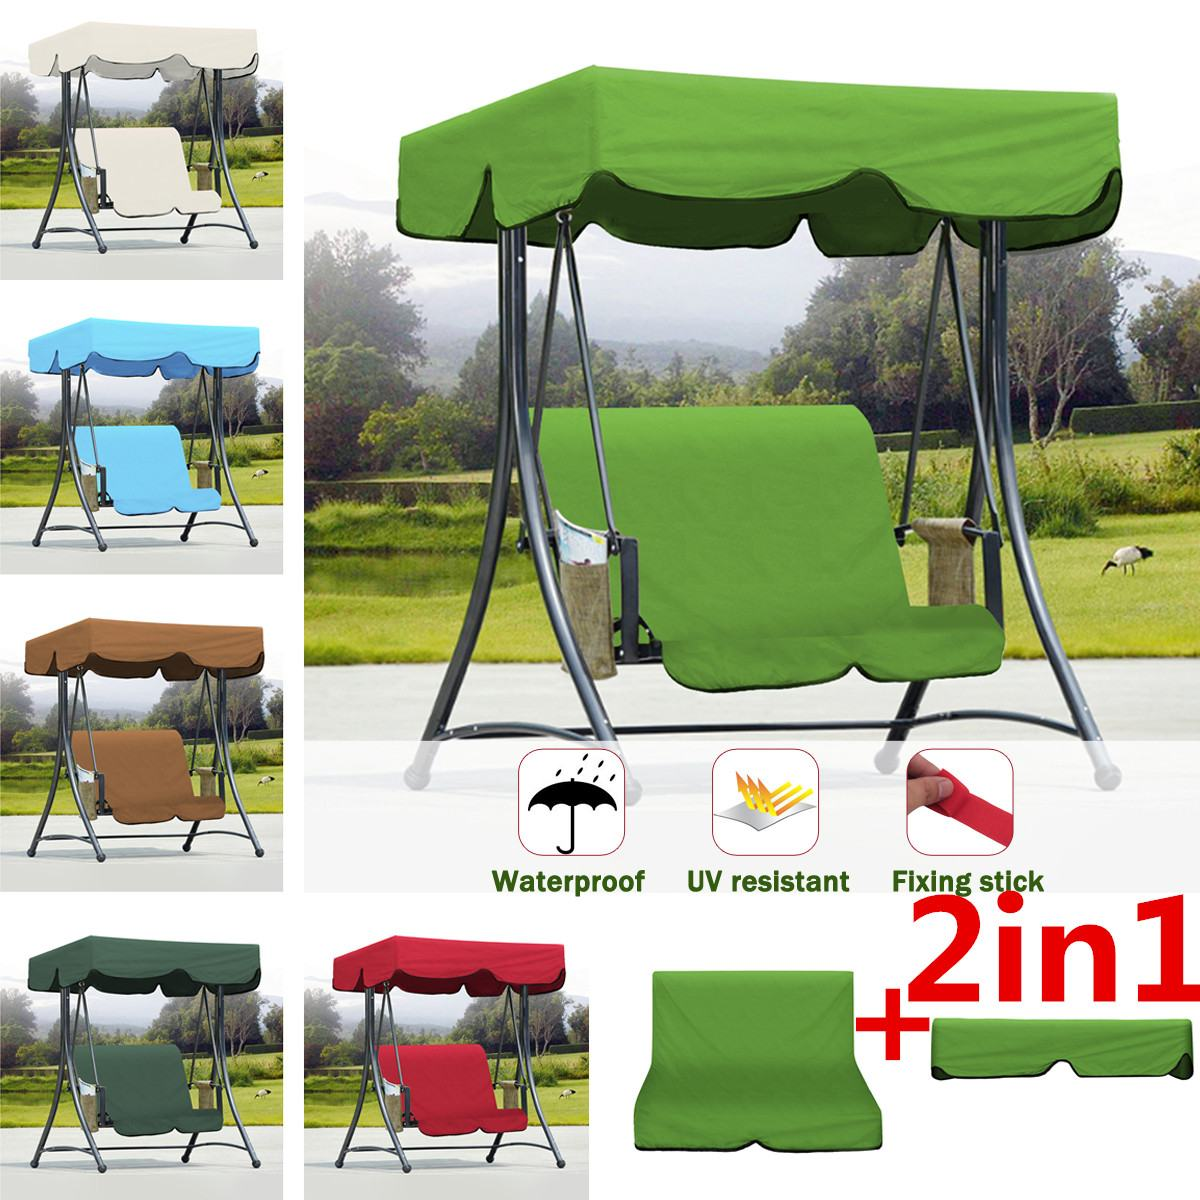 2Pcs Wasserdicht Uv Schaukel Hängematte Baldachin + Stuhl Kissen Sommer Outdoor Indoor Garten Hof Zelt Schaukel Top Abdeckung